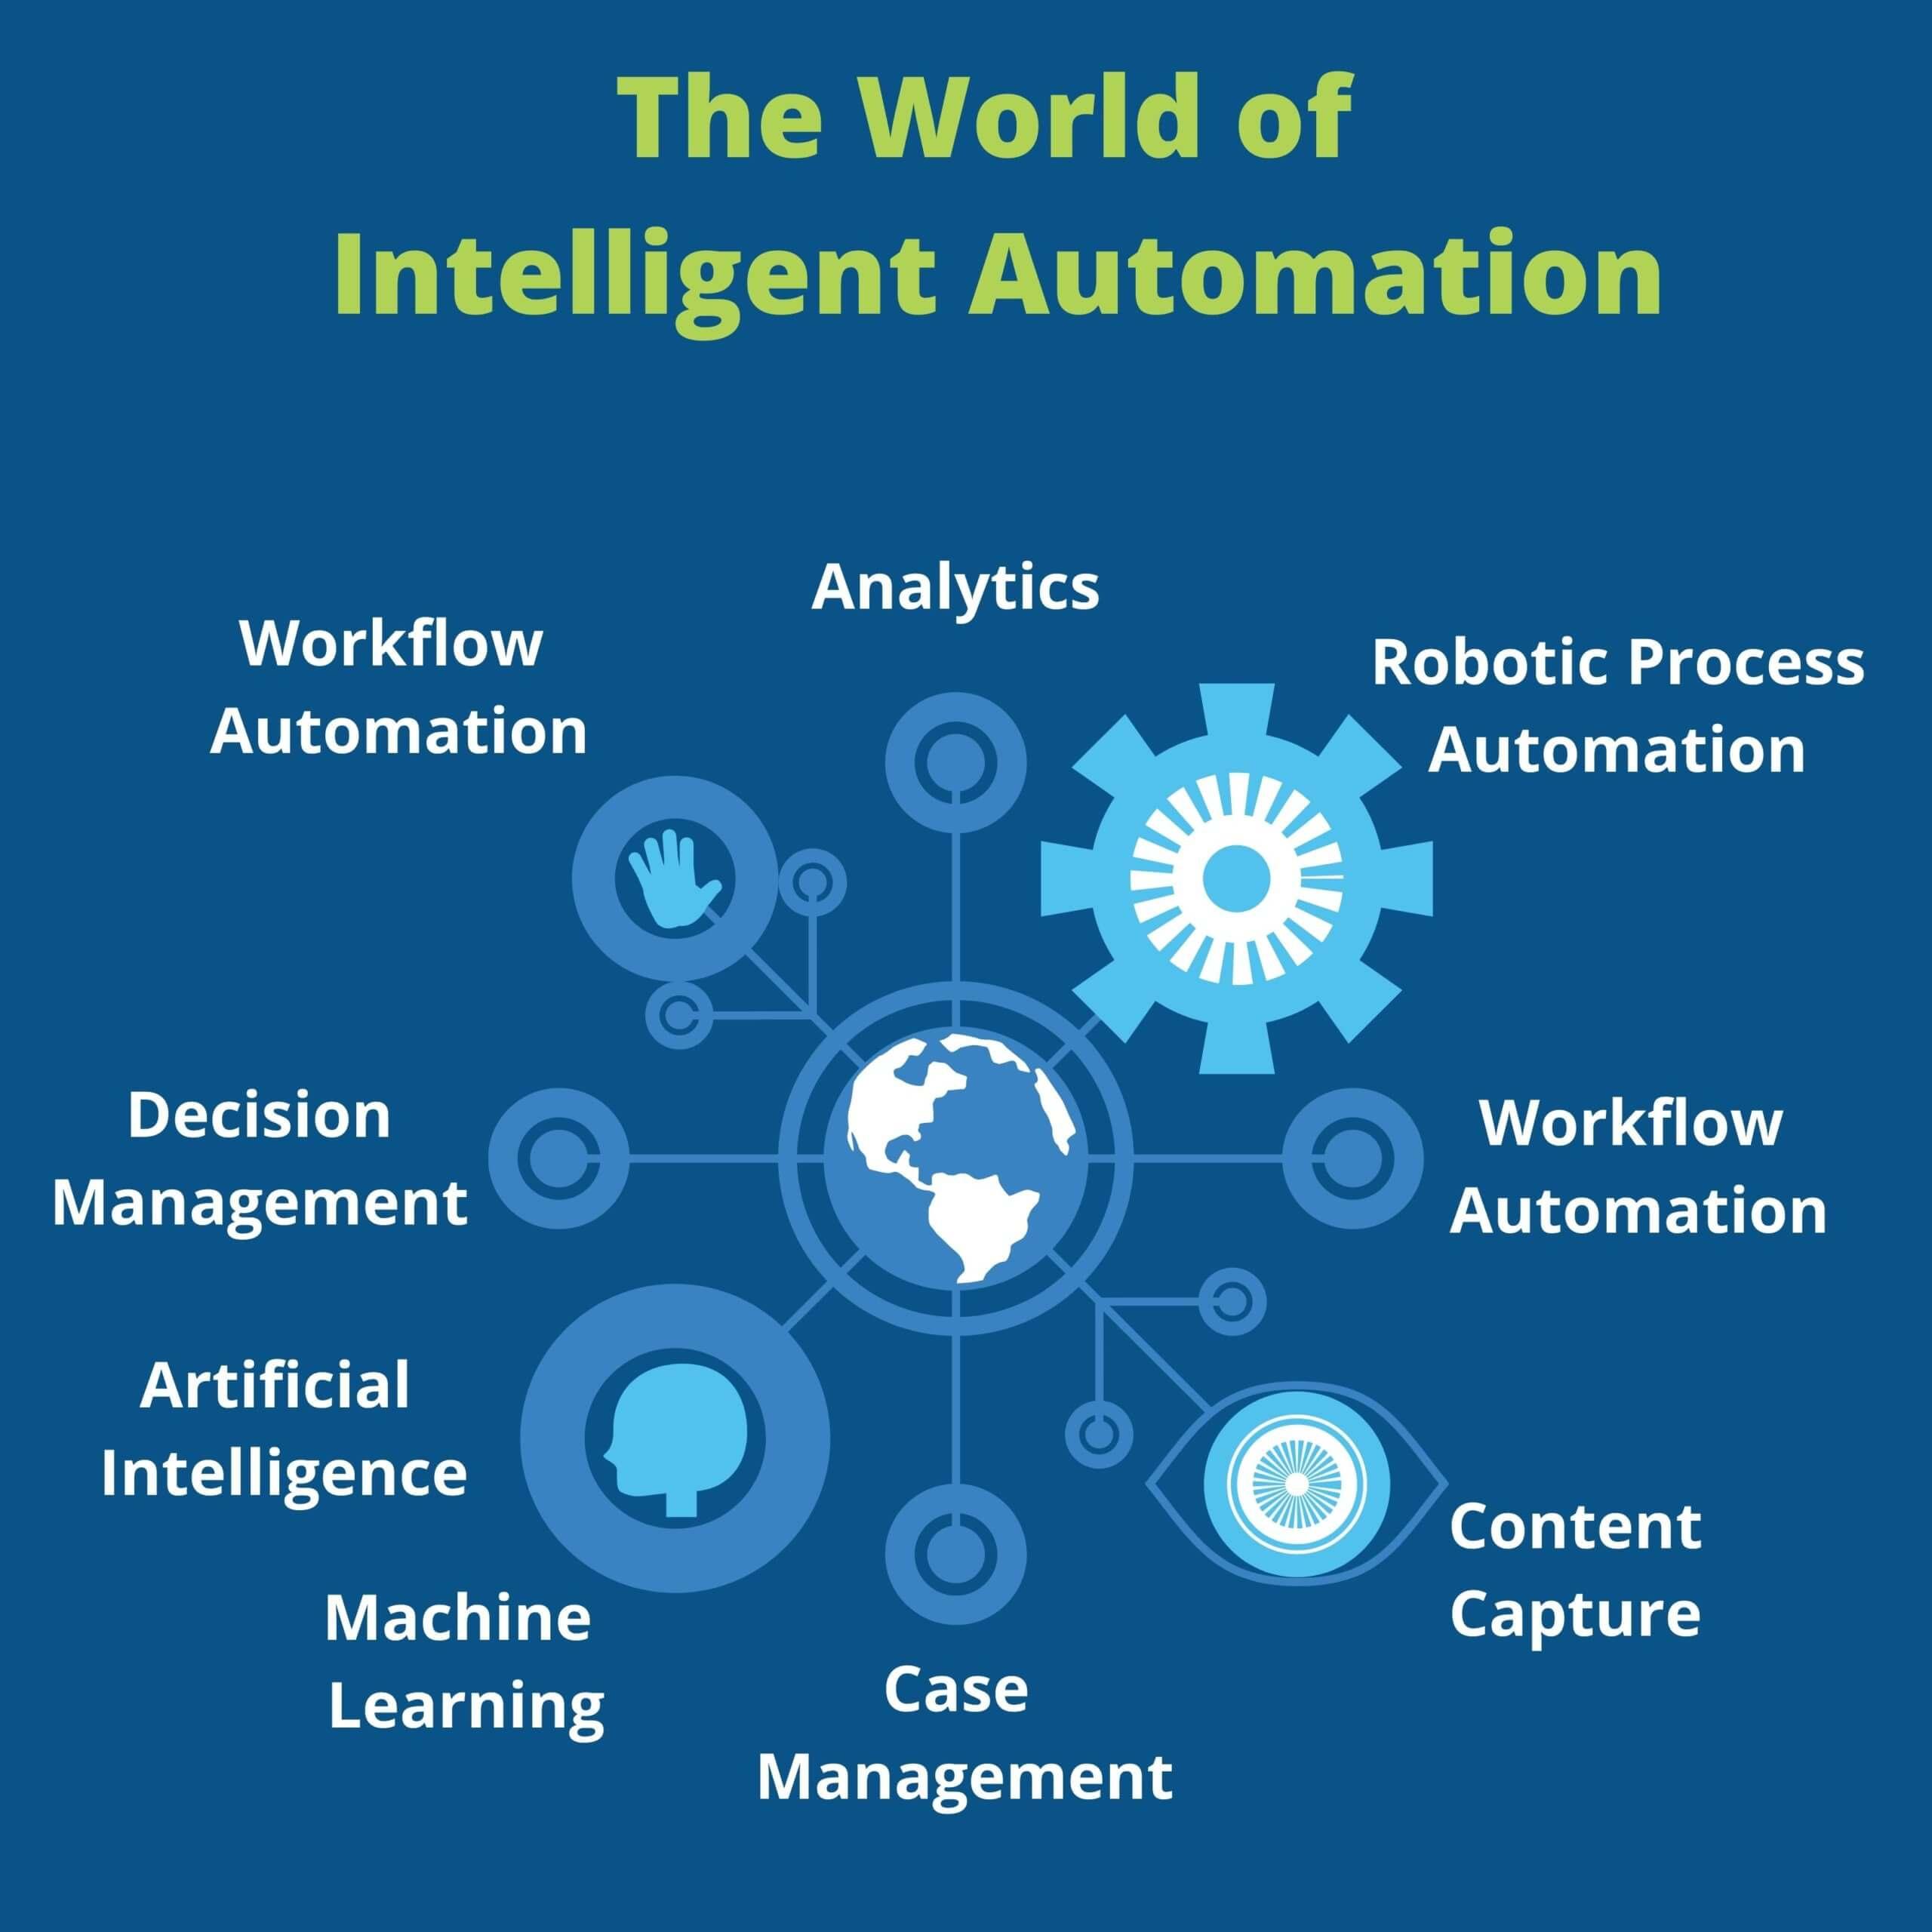 world of intelligent automation graphic image